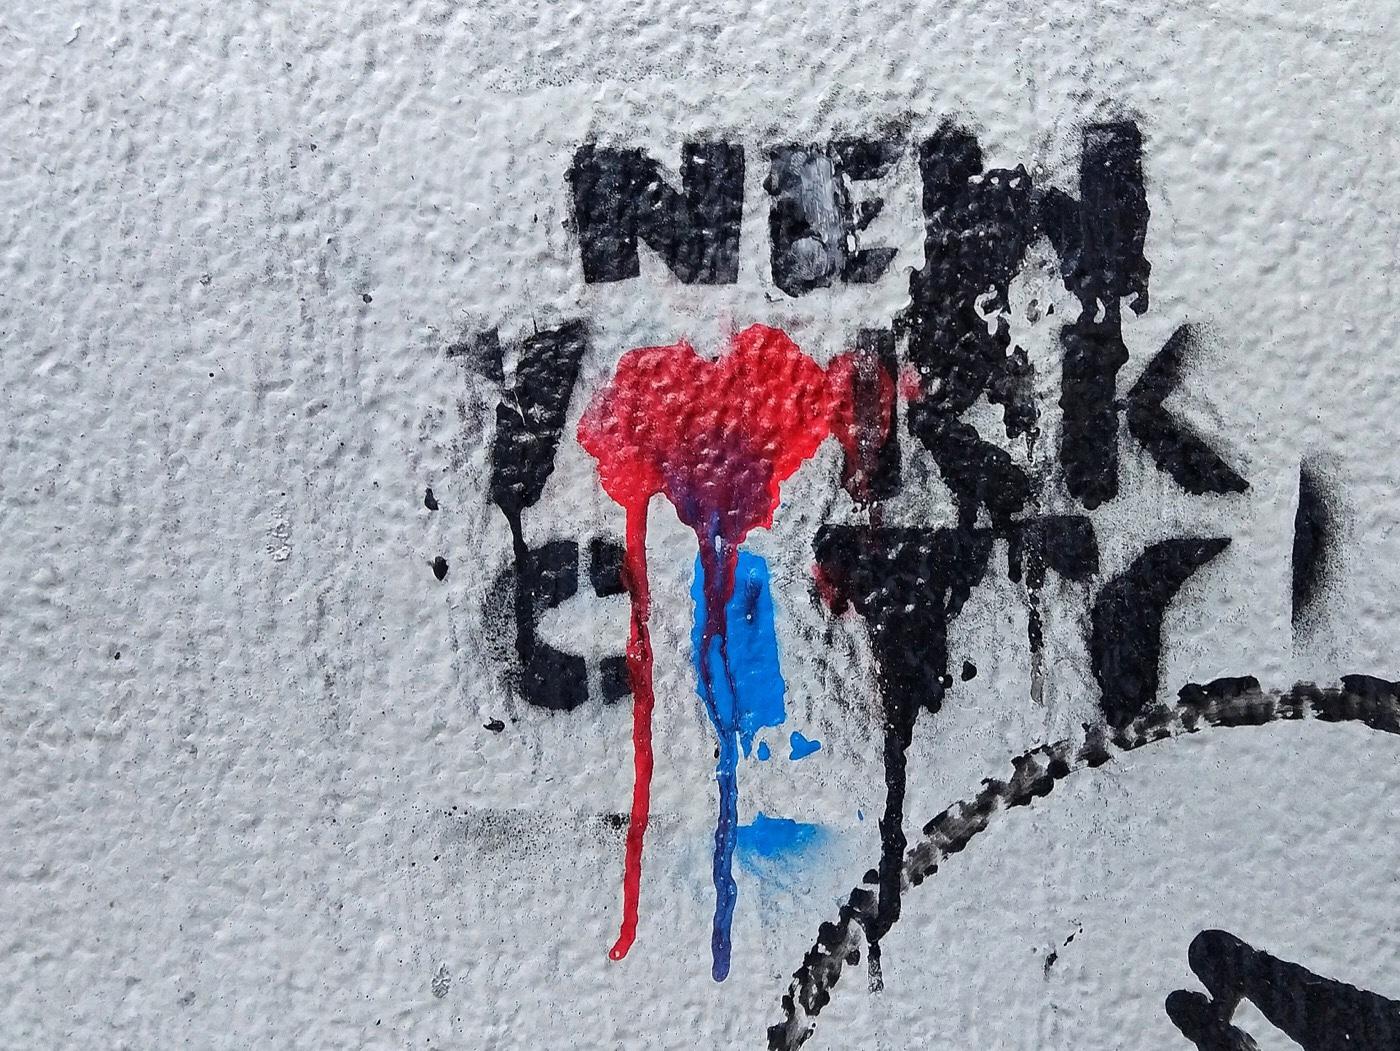 New York, Midtown Manhattan, 8th Avenue and W 46th Street